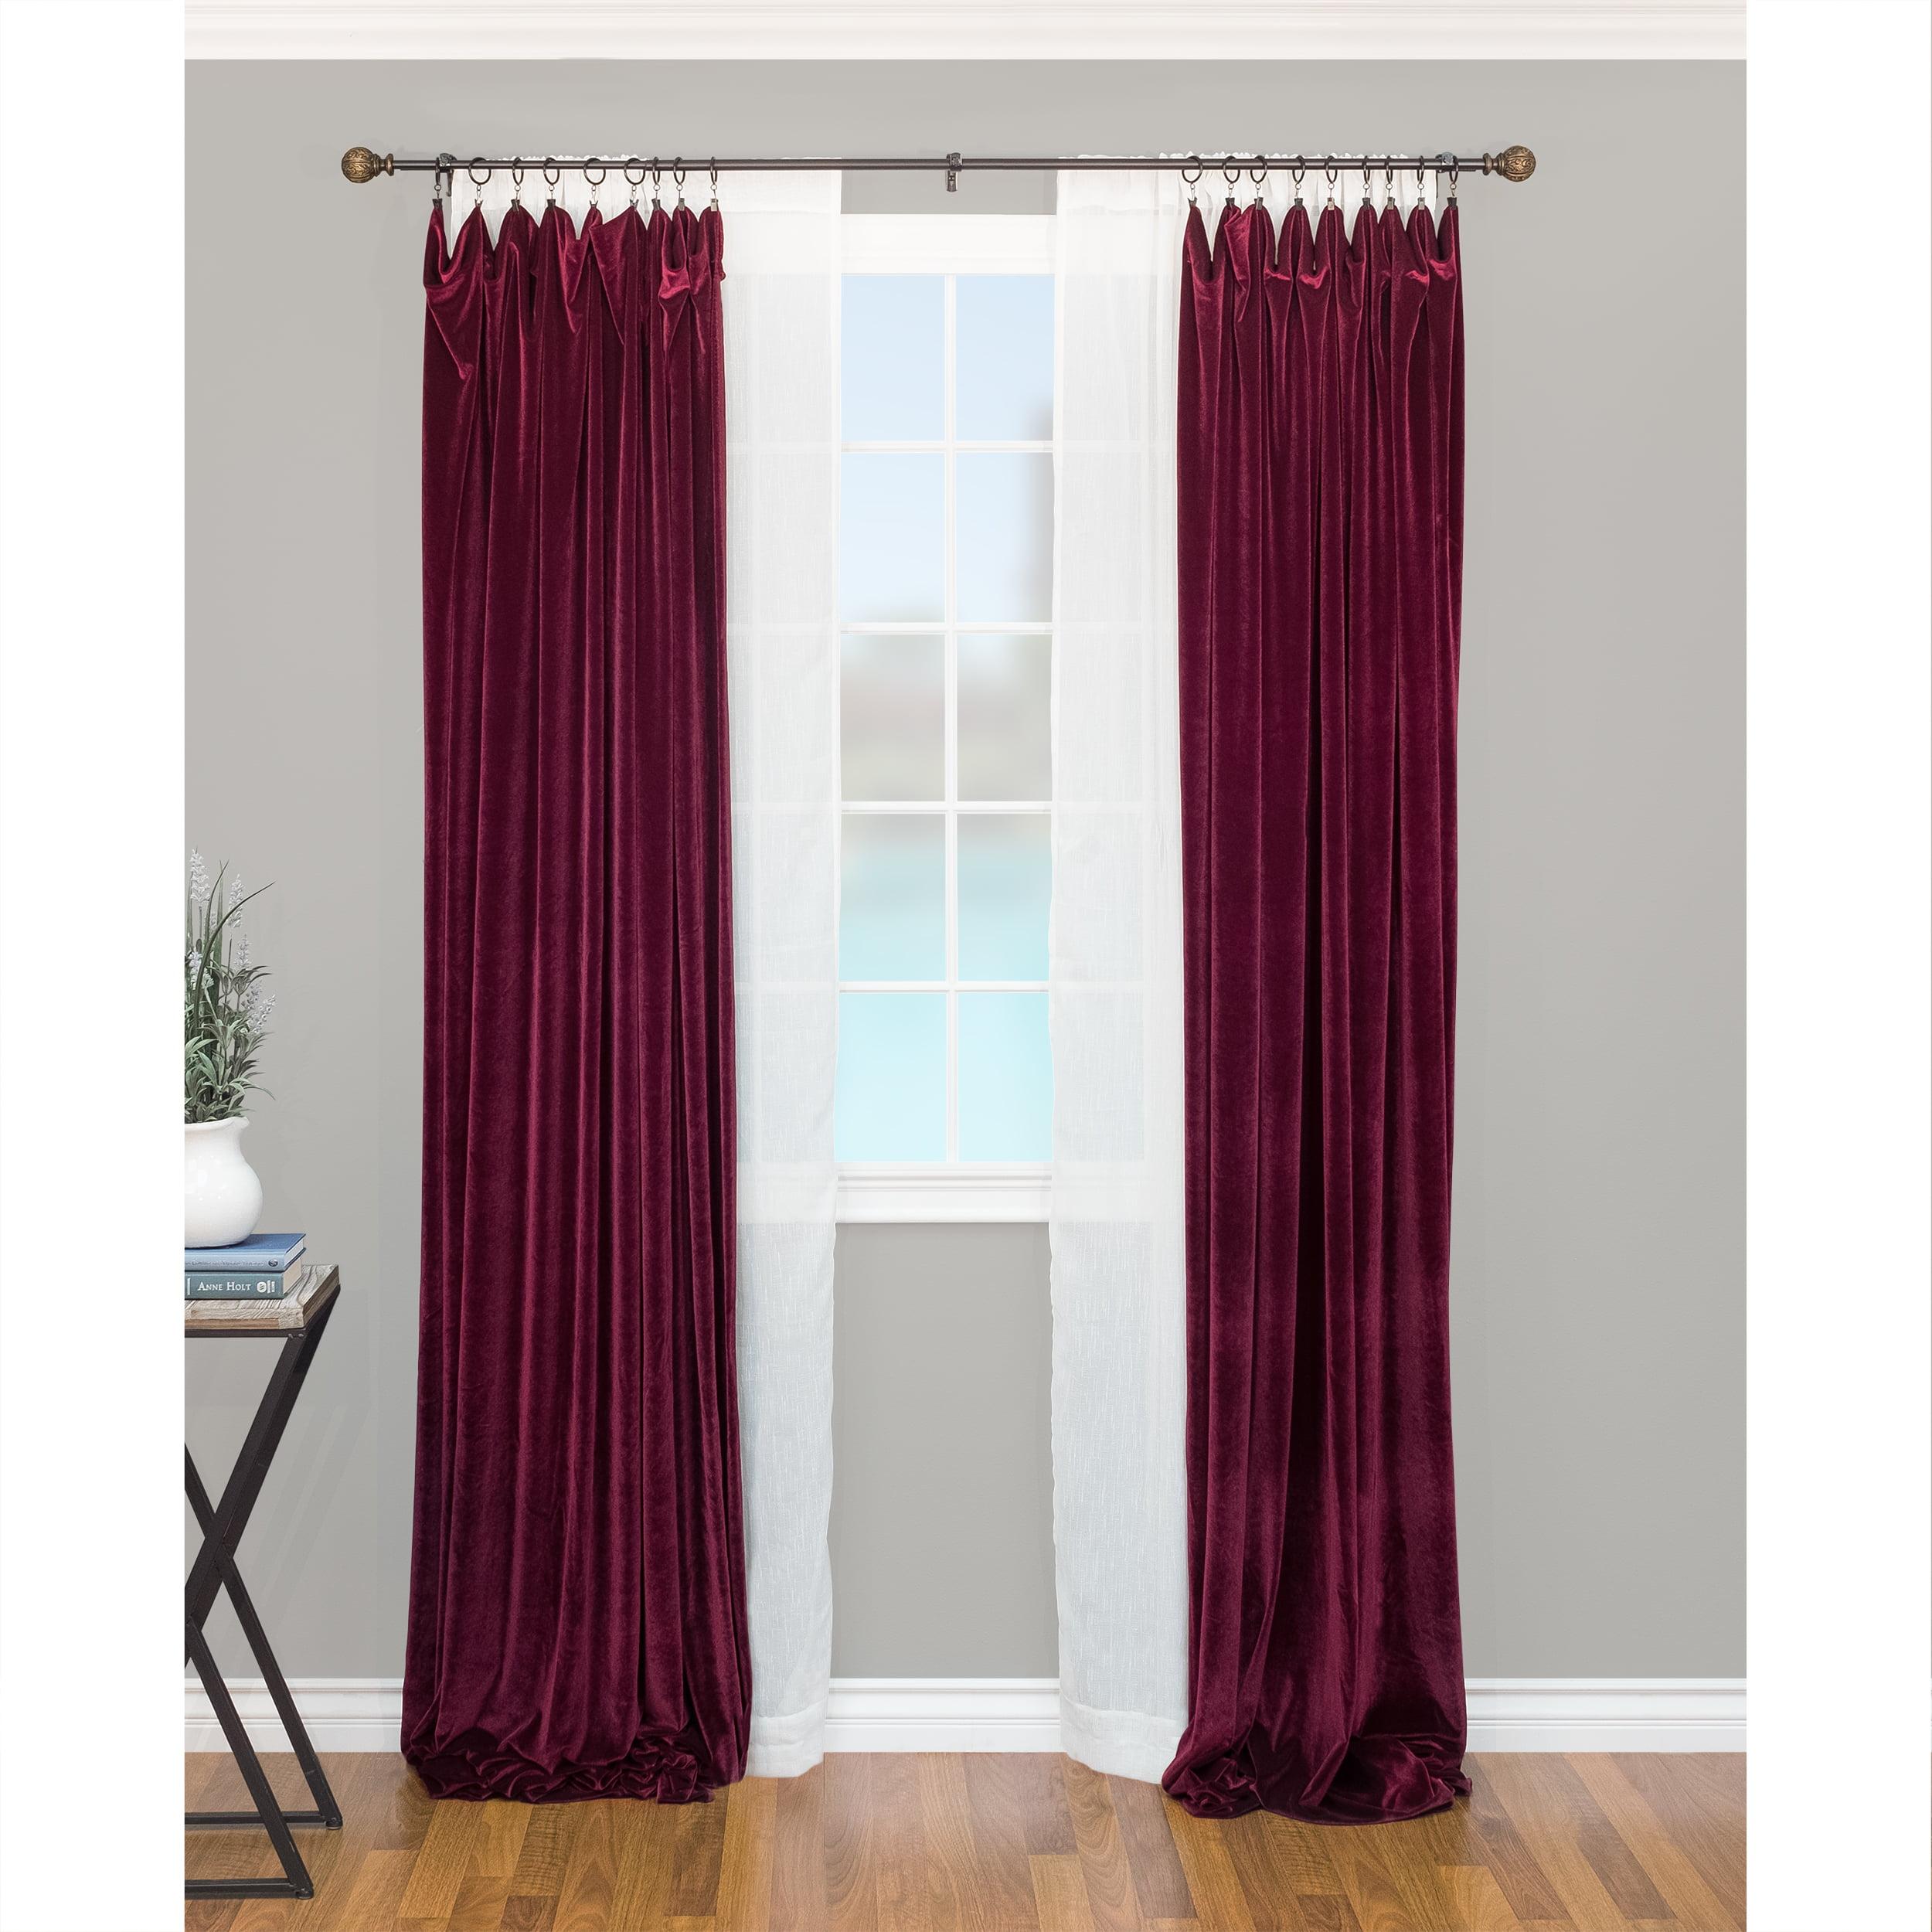 montevilla core leaf ball 5 8 double curtain rod set